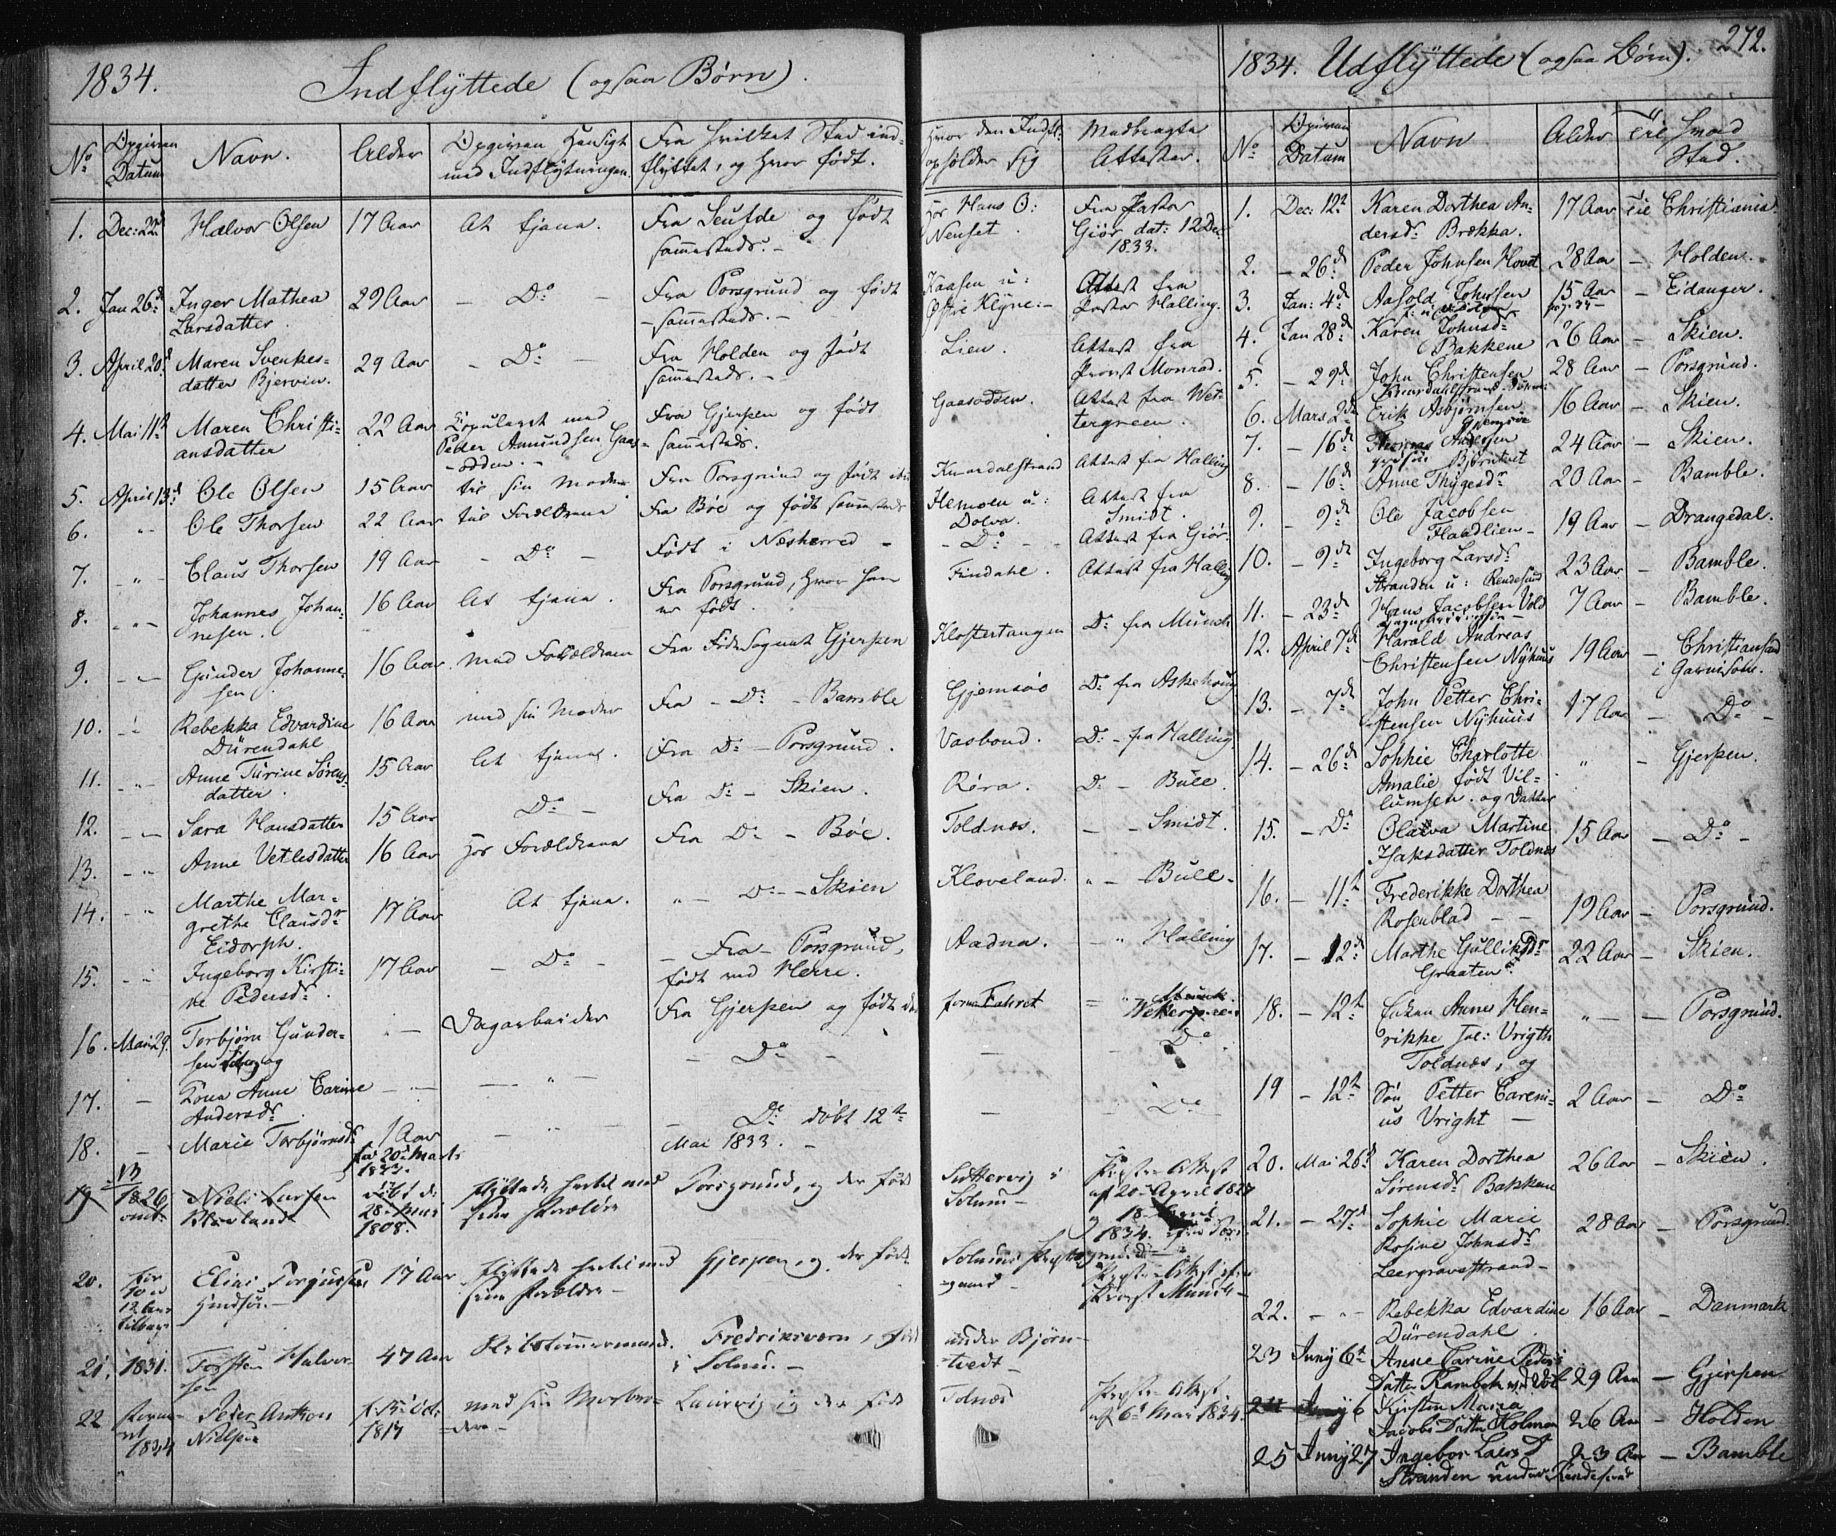 SAKO, Solum kirkebøker, F/Fa/L0005: Ministerialbok nr. I 5, 1833-1843, s. 272